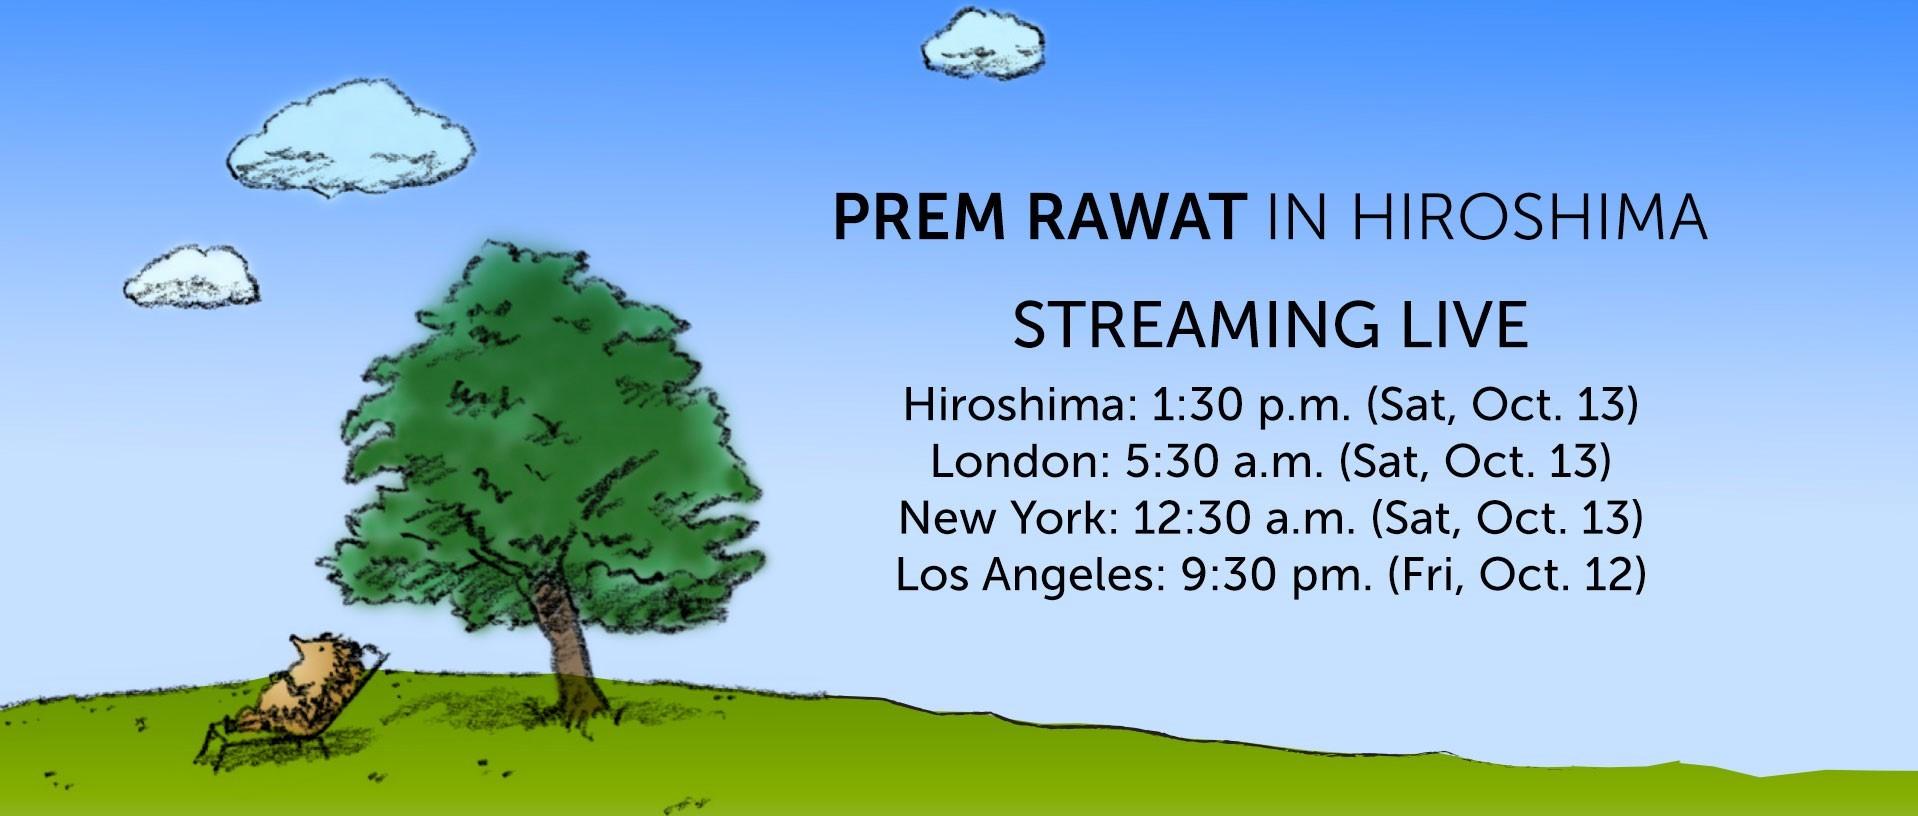 LiveStream with Prem Rawat: Saturday, October 13